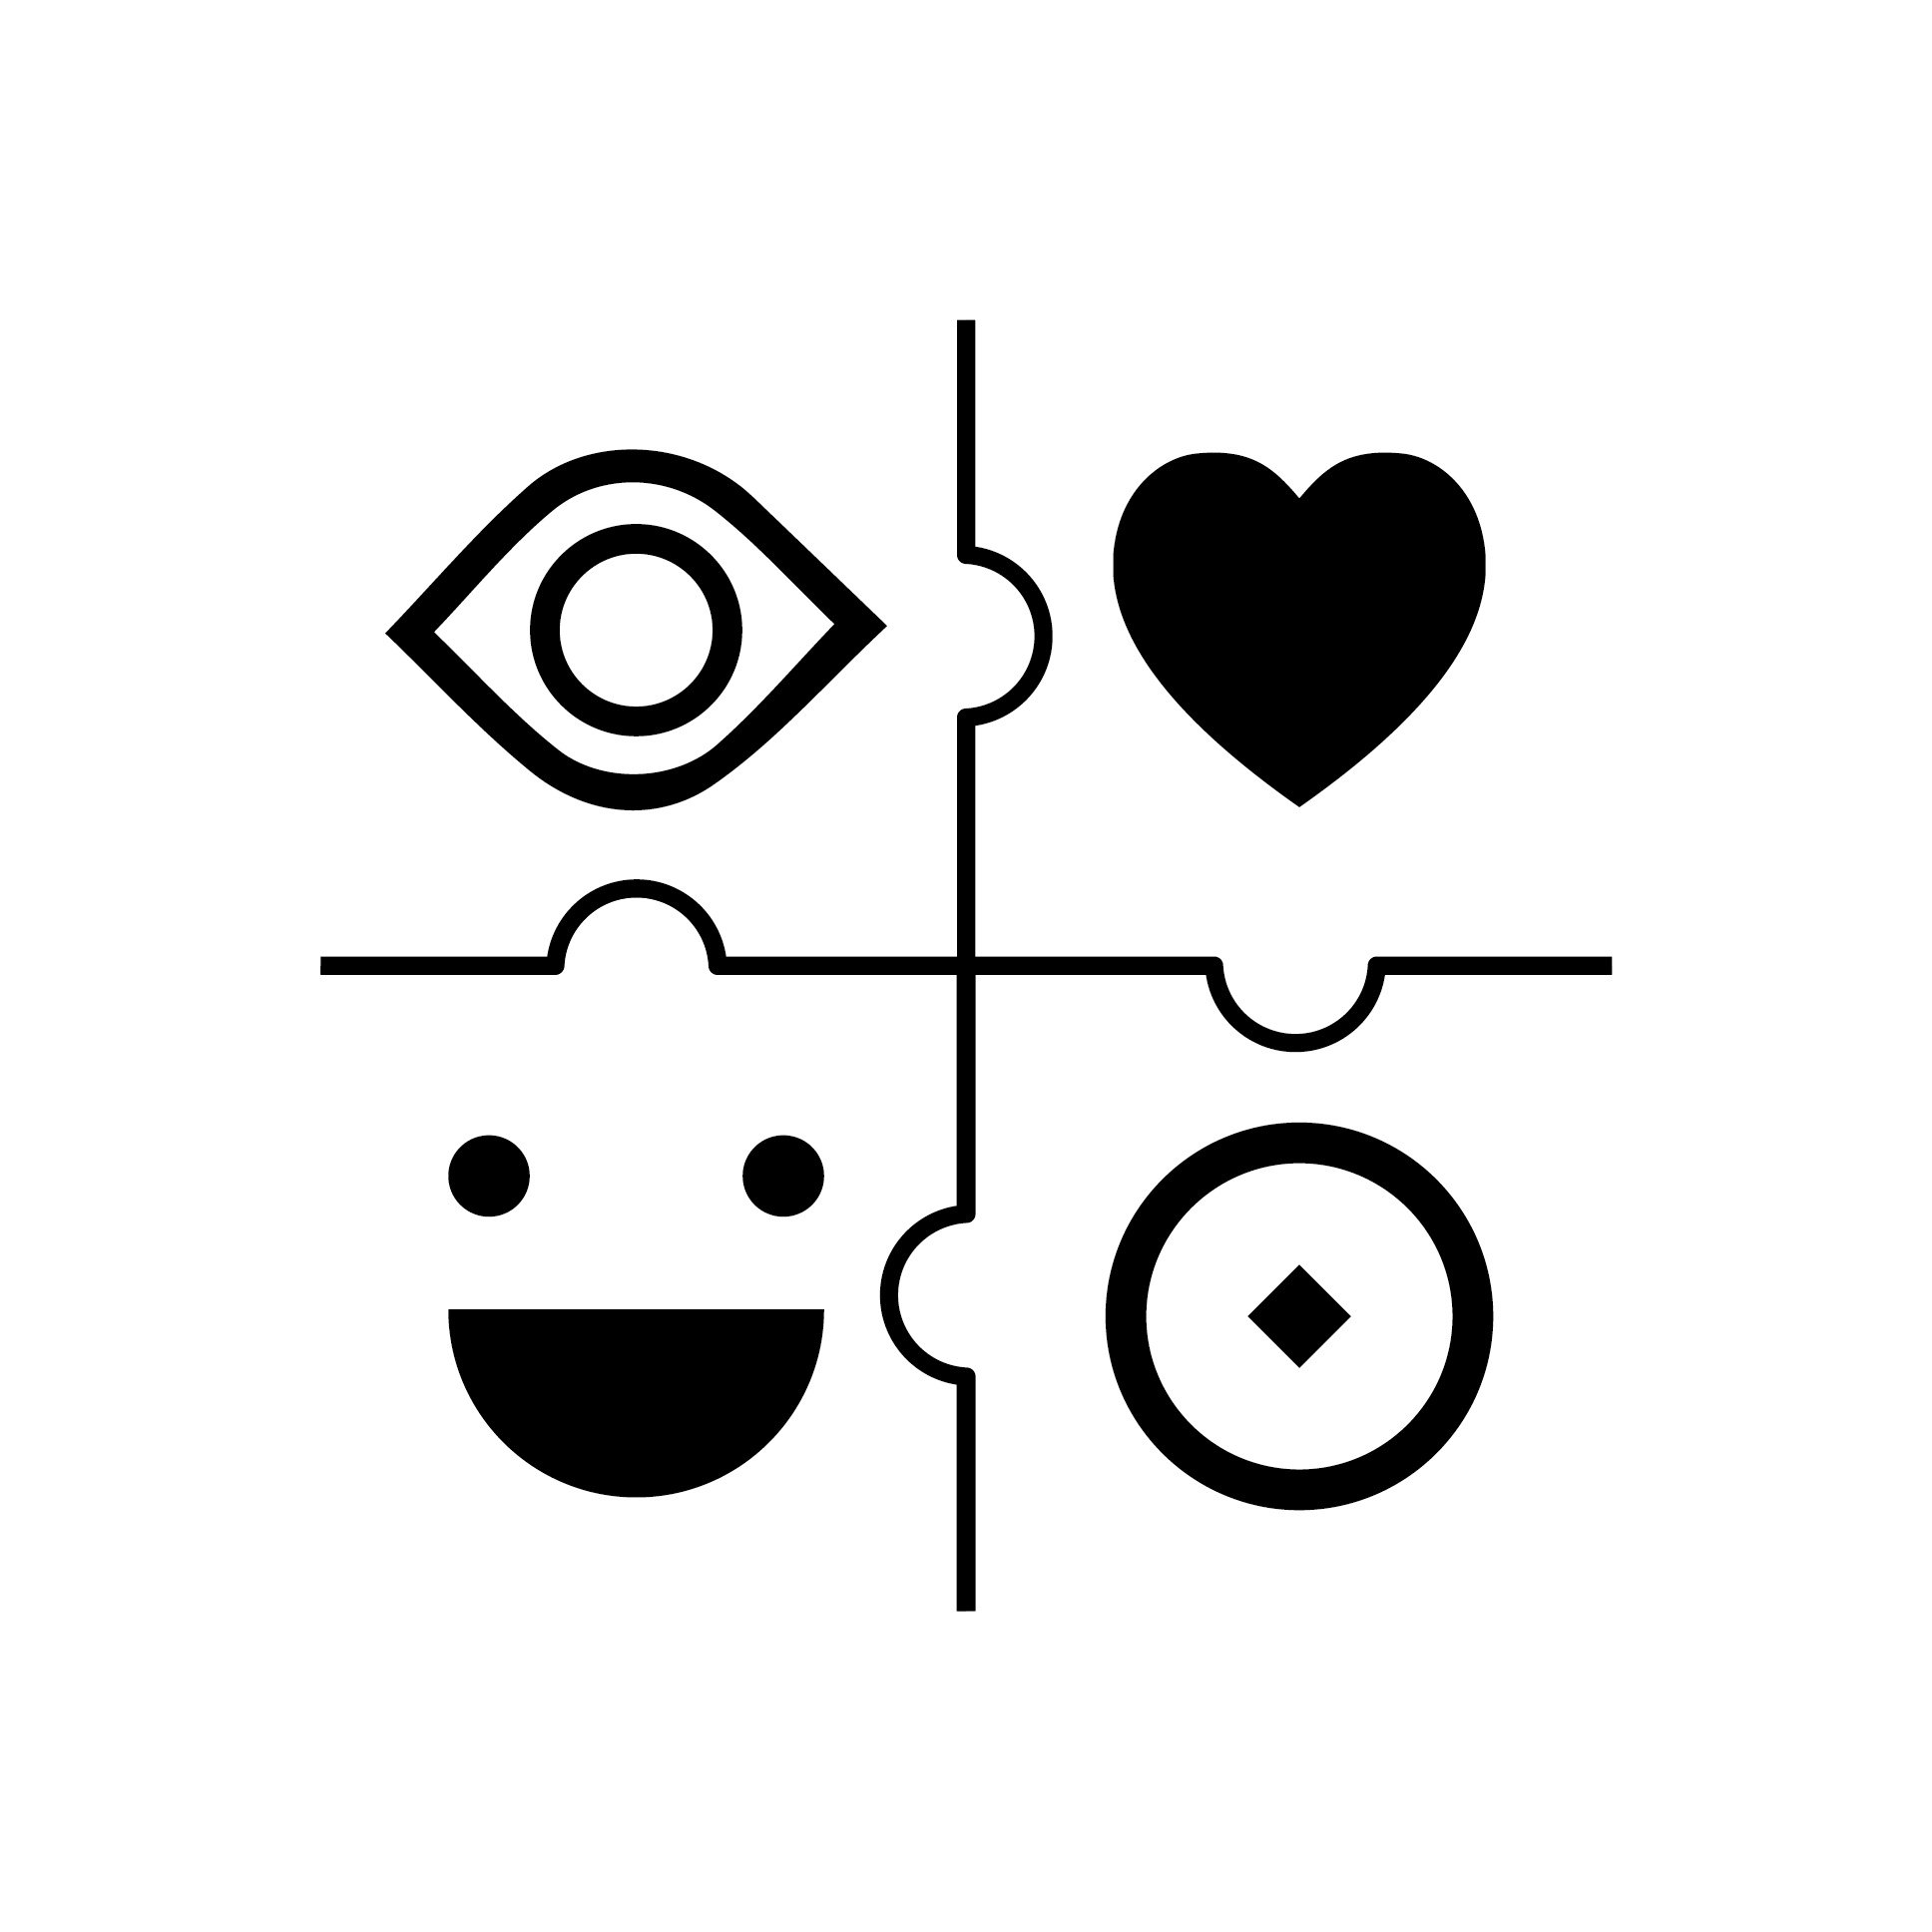 神爱玩财 Logo